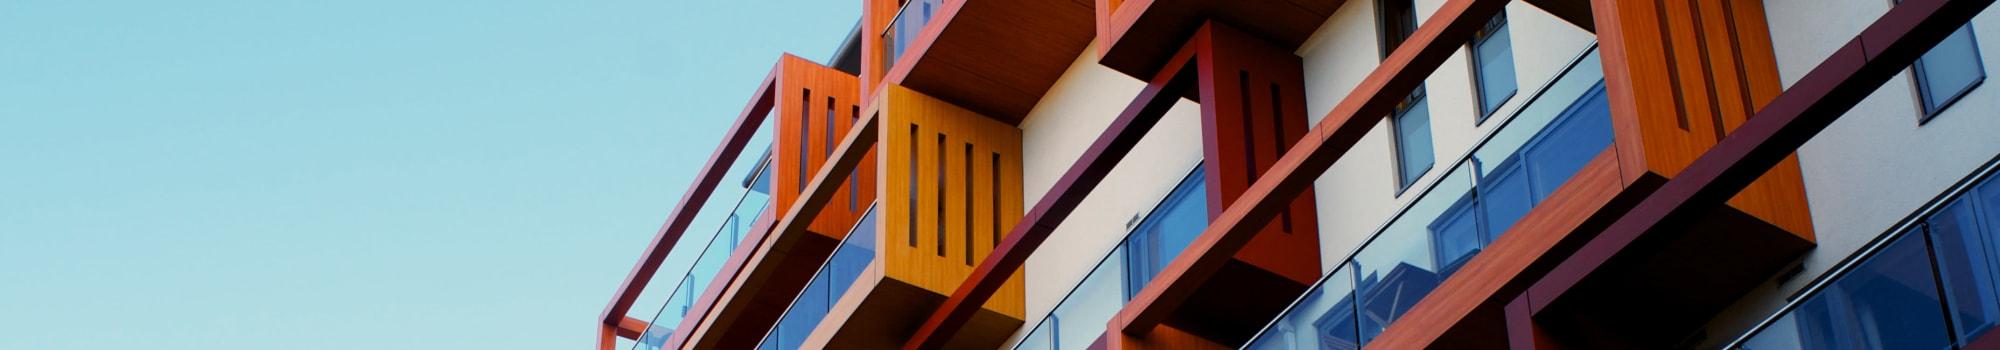 Maintenance Request of Hillside Apartments in Pearisburg, Virginia